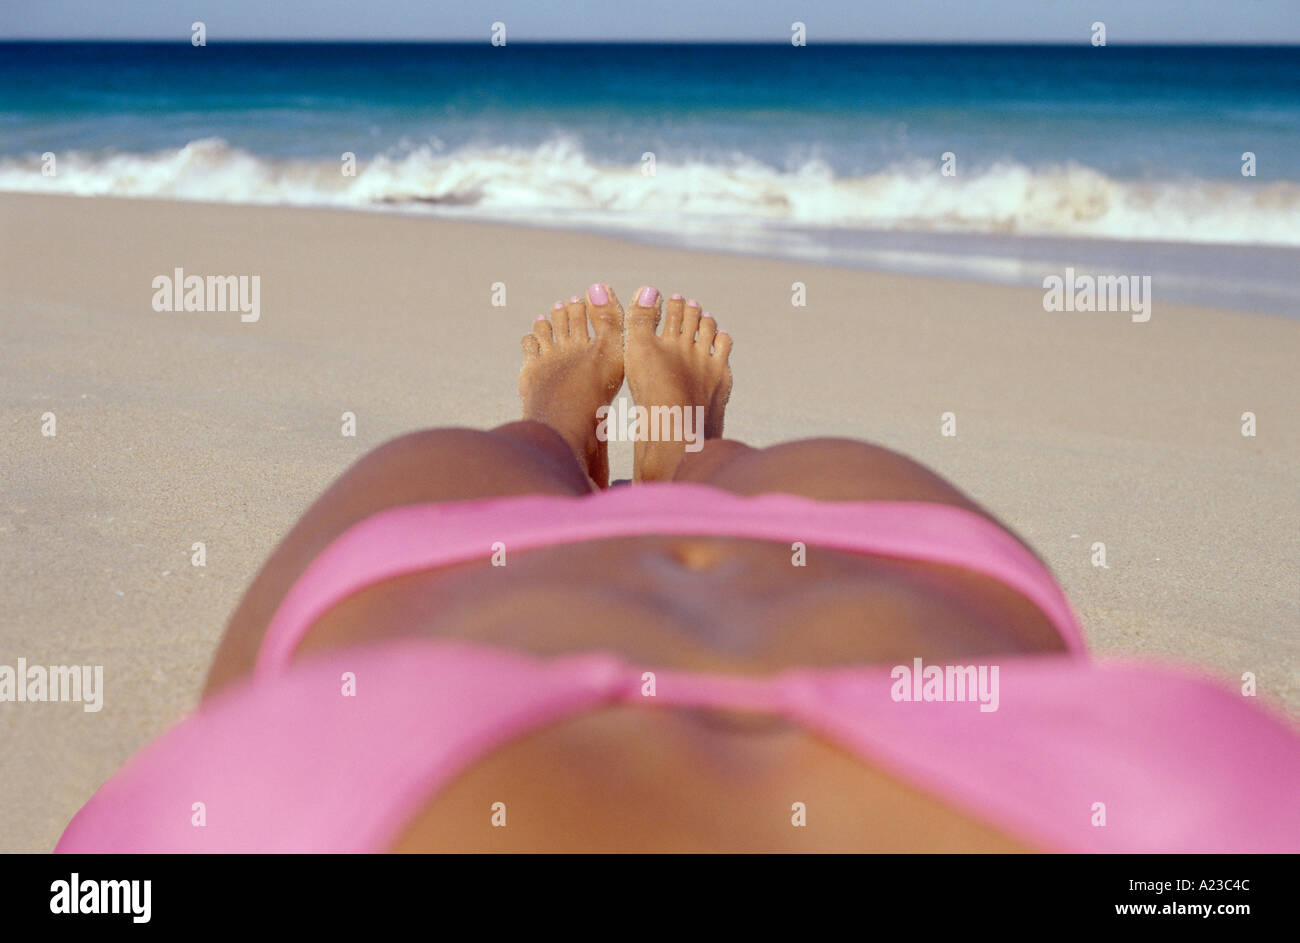 6366ae65990 Pink Bikini Stock Photos & Pink Bikini Stock Images - Alamy